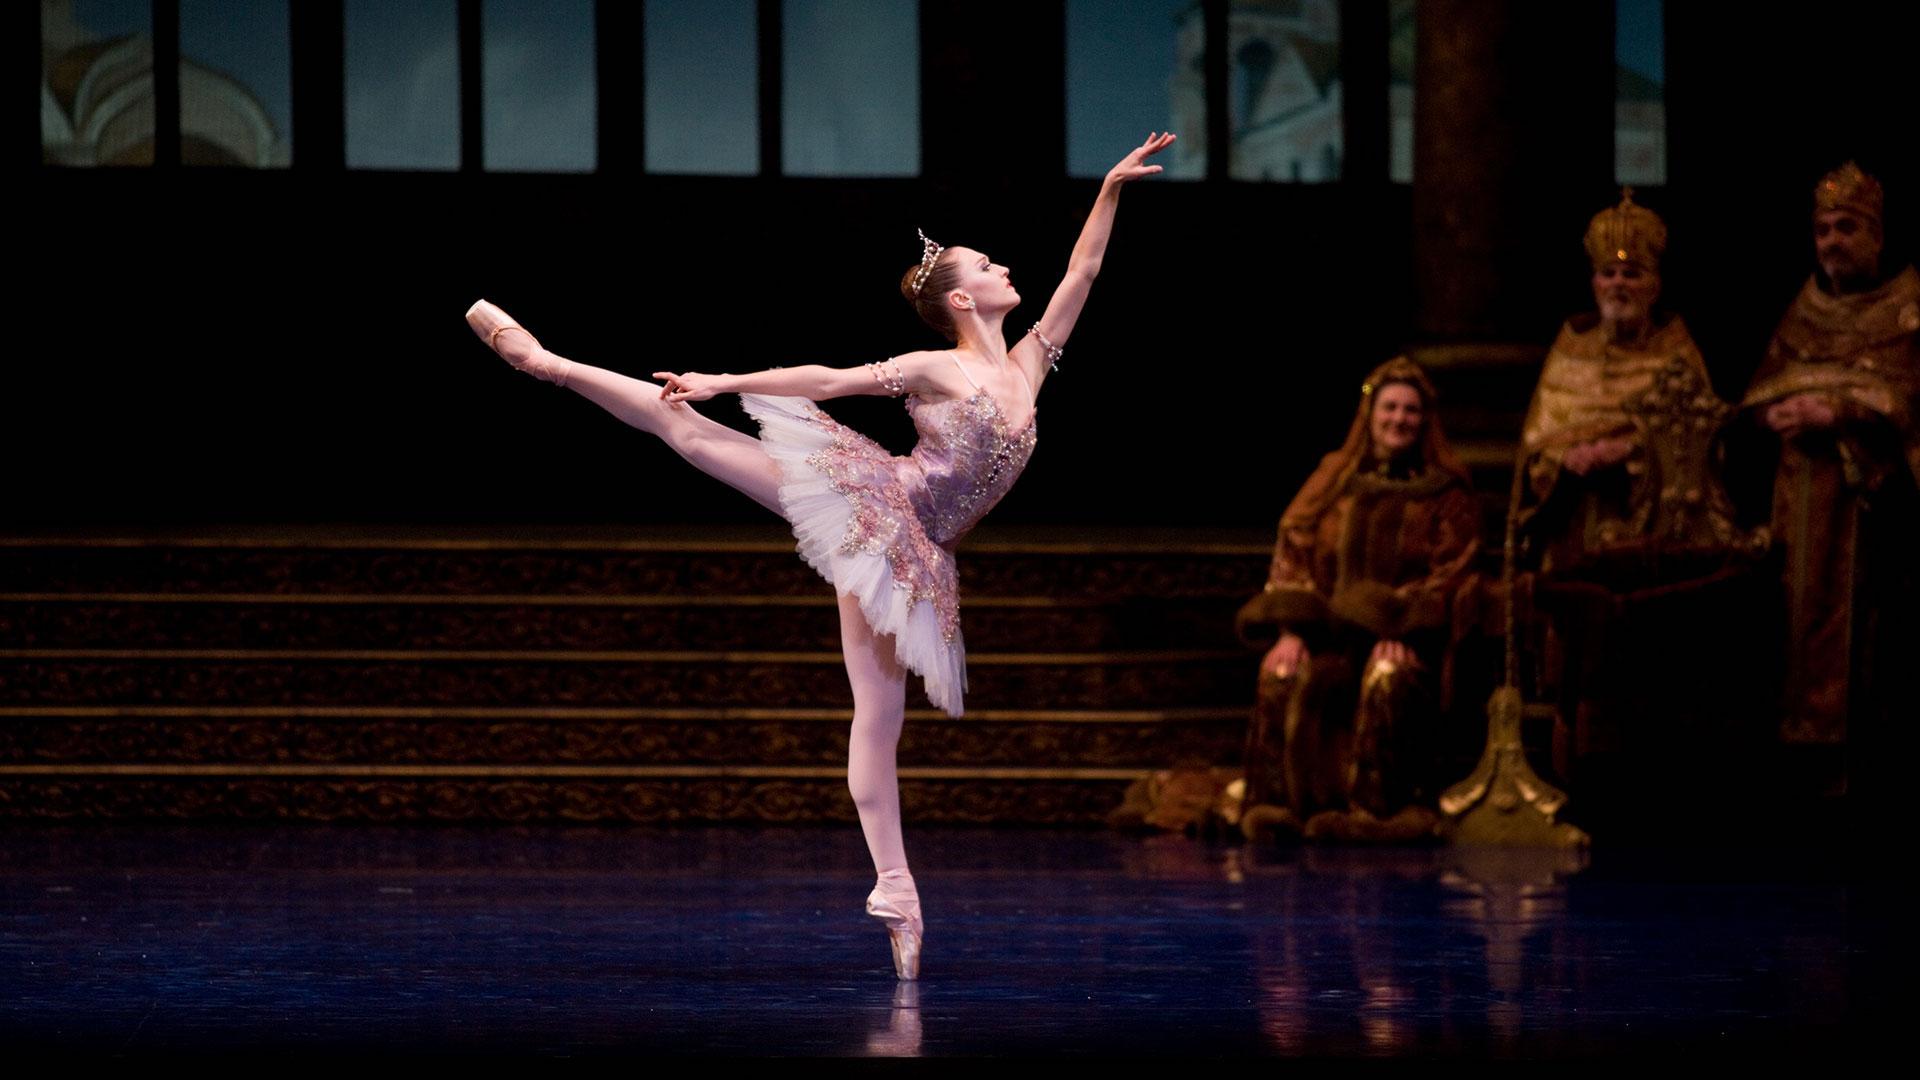 Sarah Van Patten in Tomasson's The Sleeping Beauty